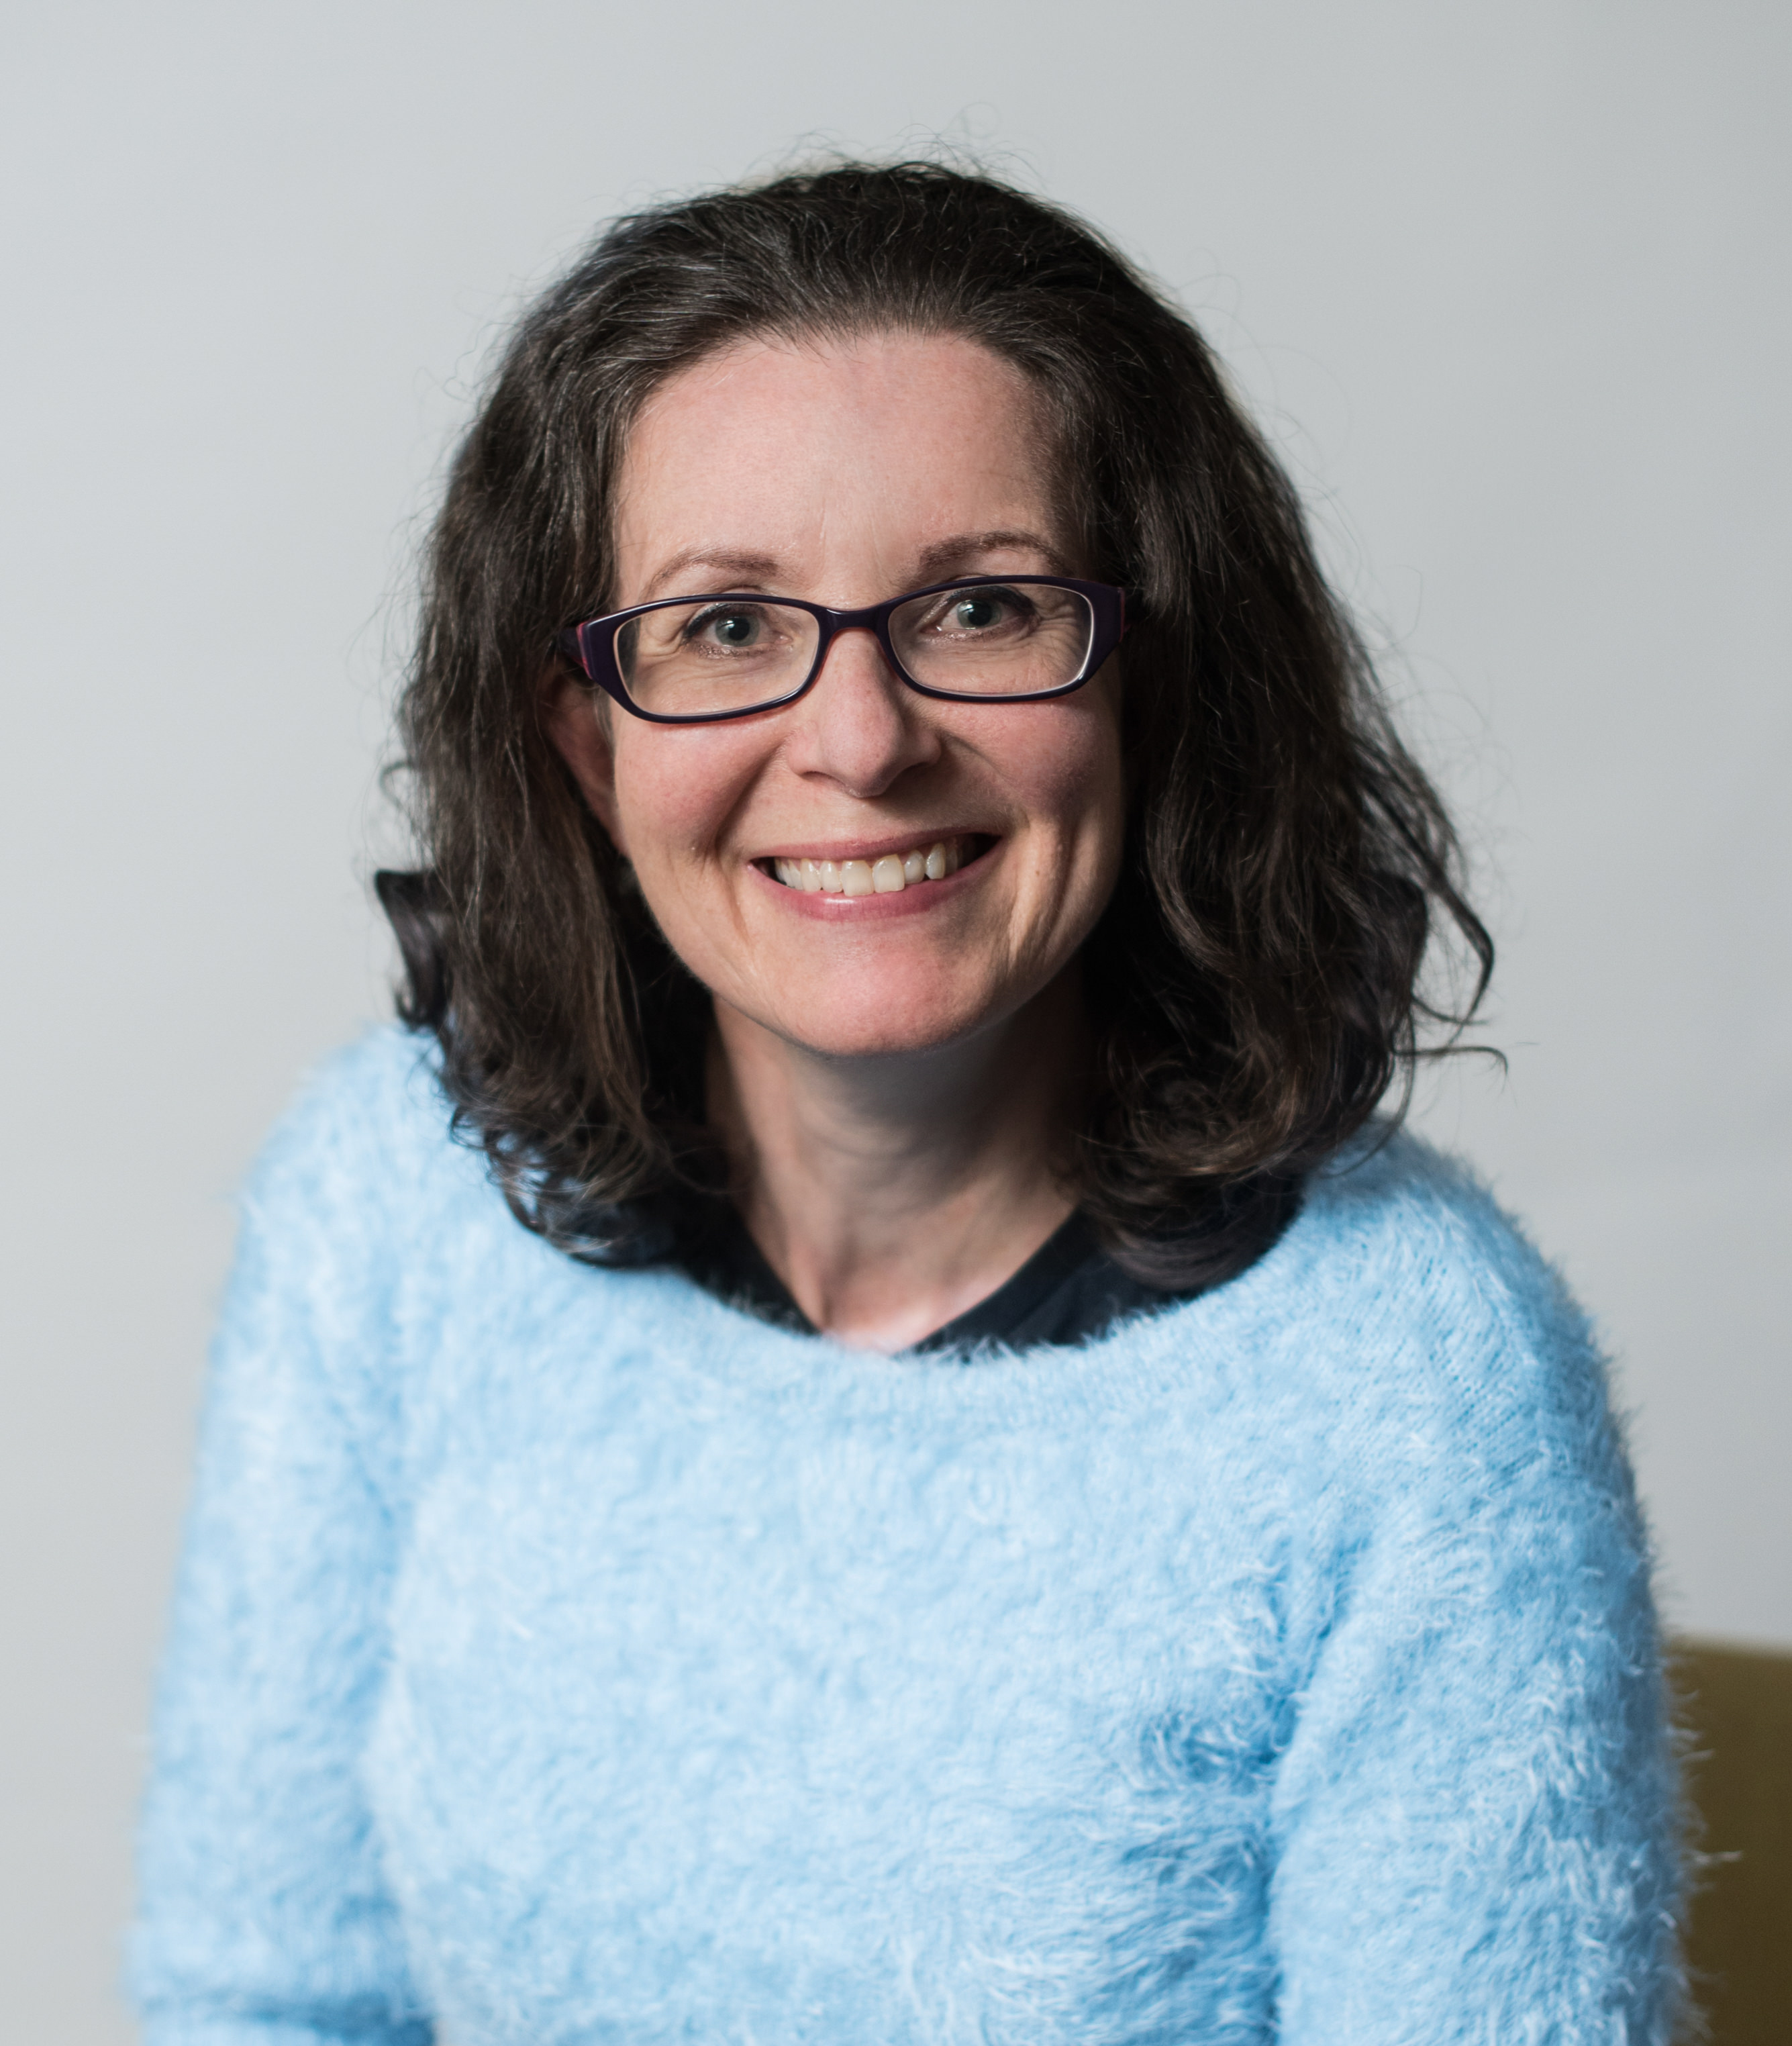 Headshot image of Clare Wildfire, Mott MacDonald technical principal